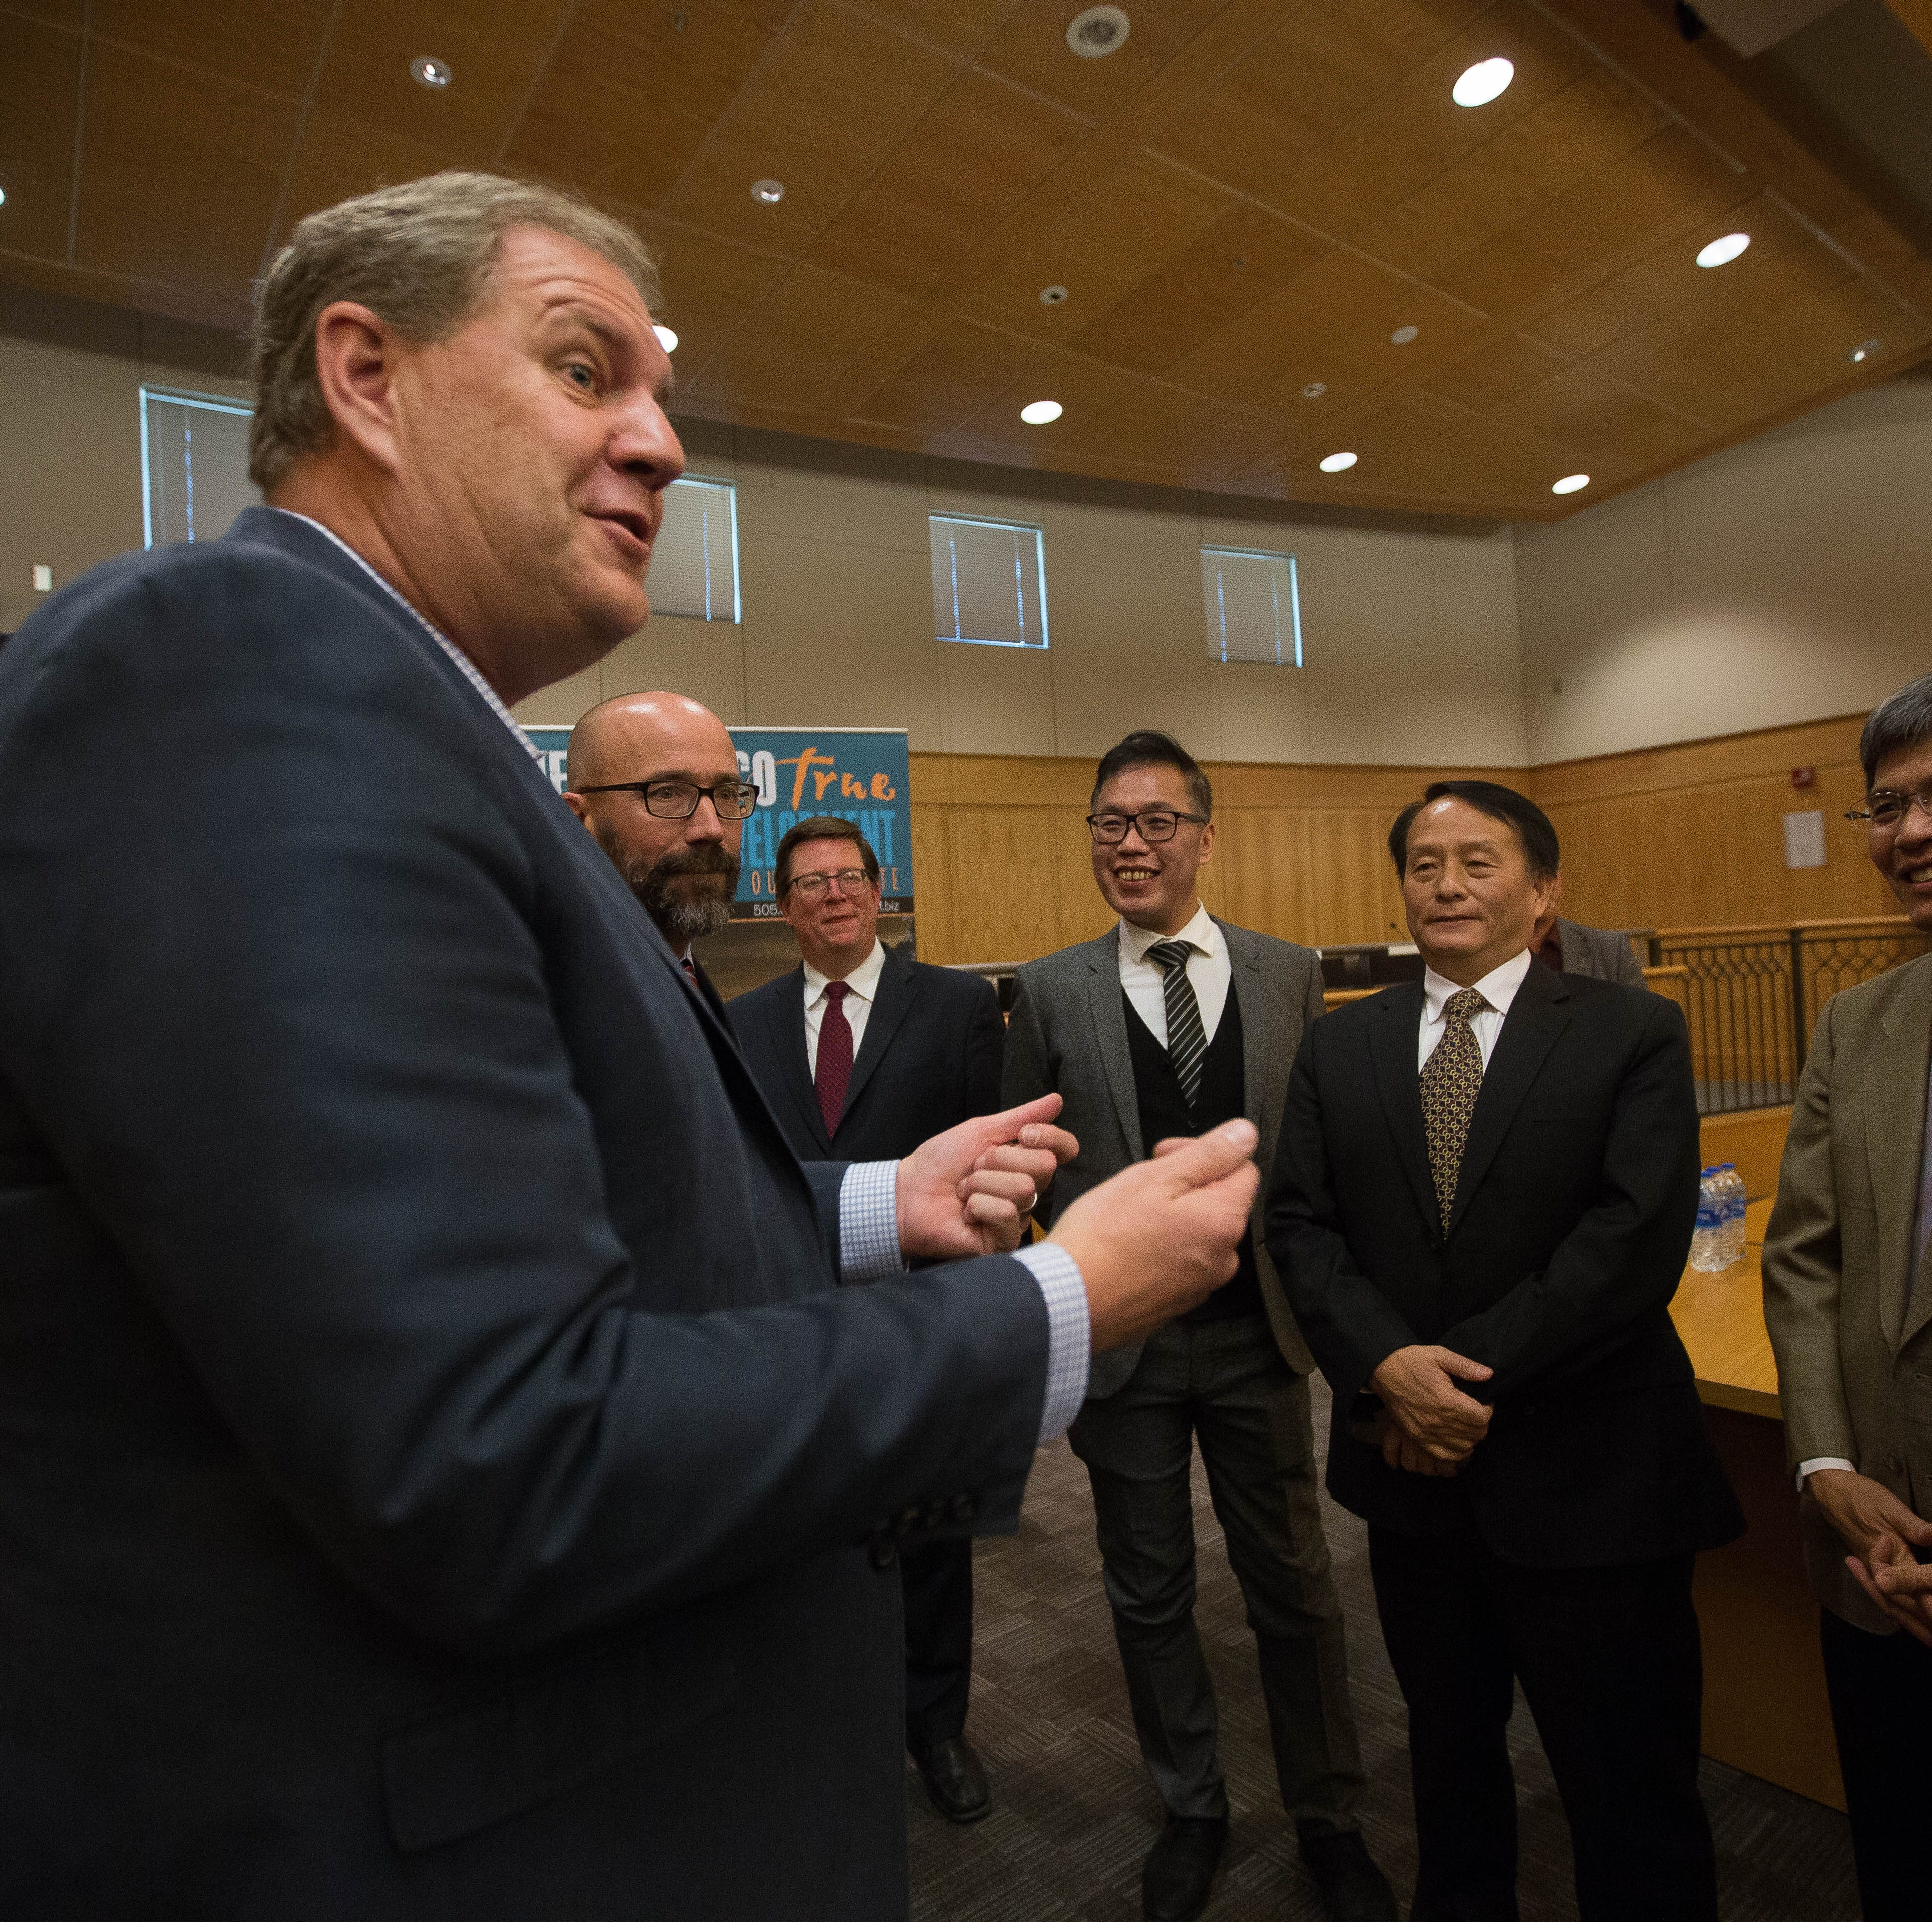 Keith Gardner Chief Of Staff For Gov Susana Martinez Left Speaks With